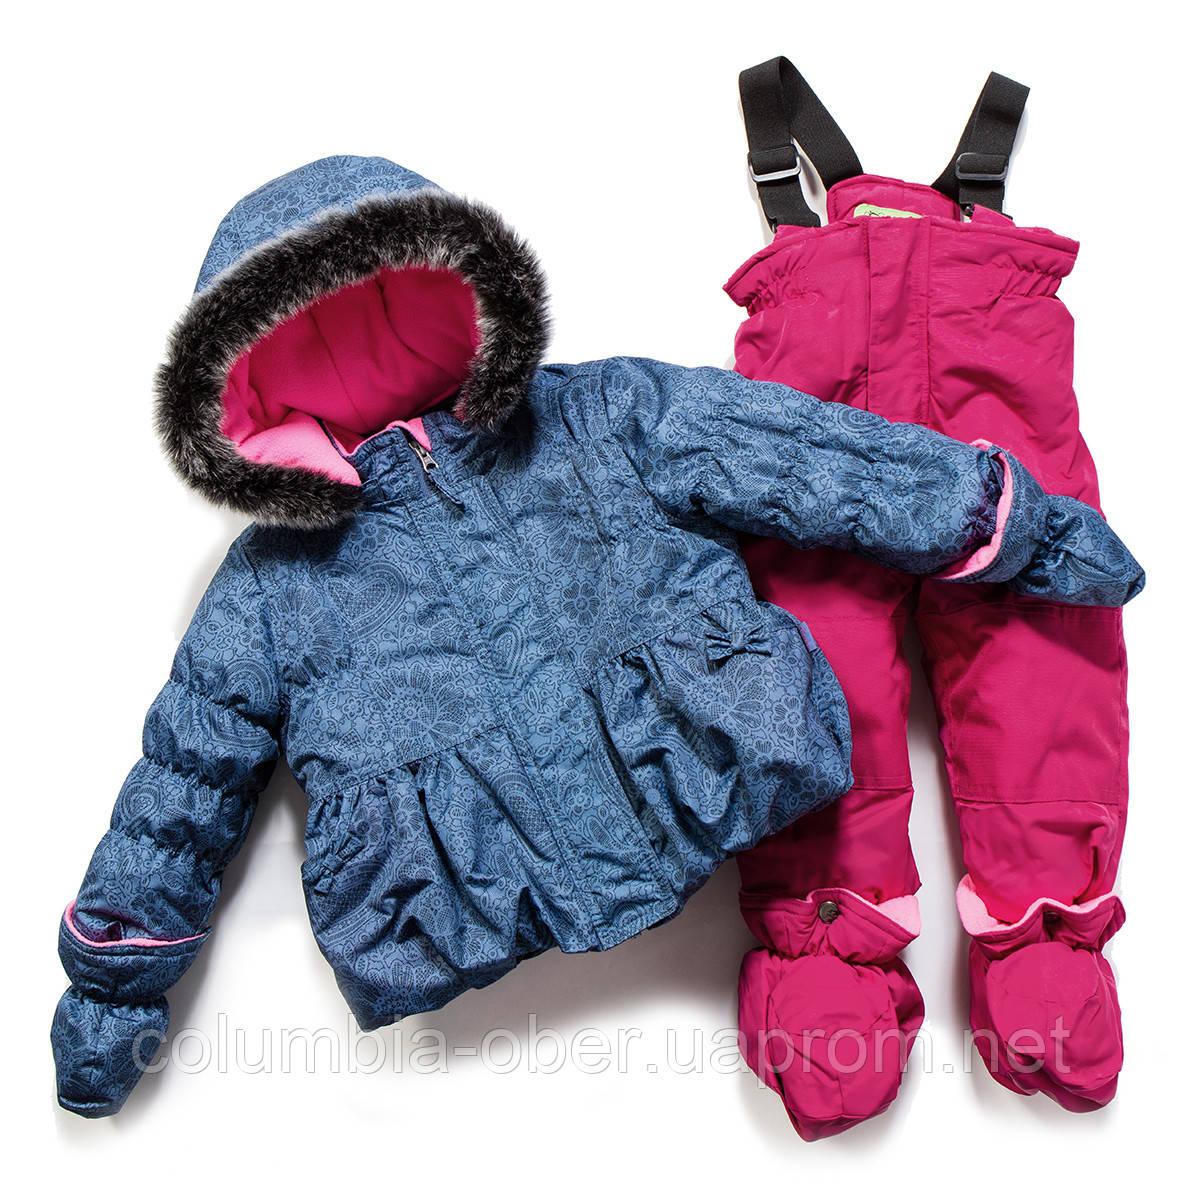 Зимний костюм для девочки PELUCHE F17 M 16 BF China Blue / Berry. Размеры 75 - 97.